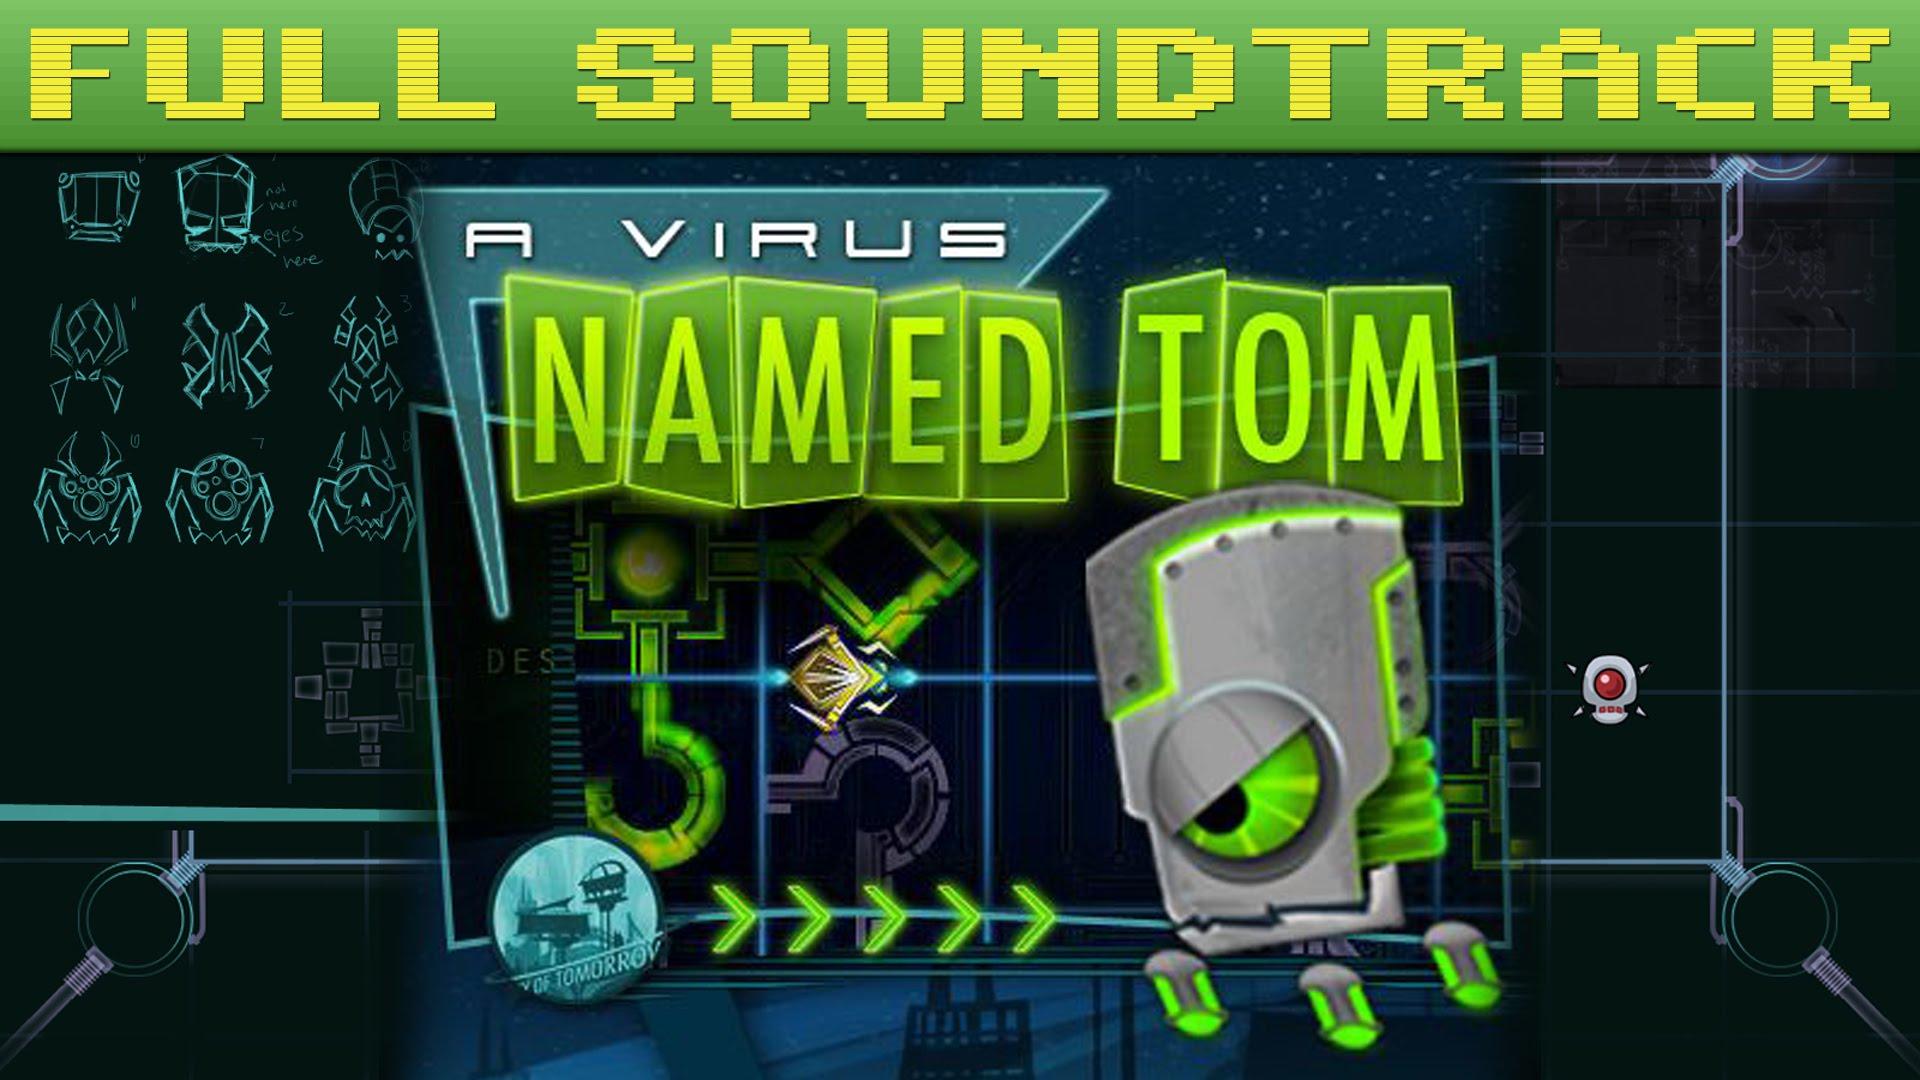 High Resolution Wallpaper | A Virus Named TOM 1920x1080 px